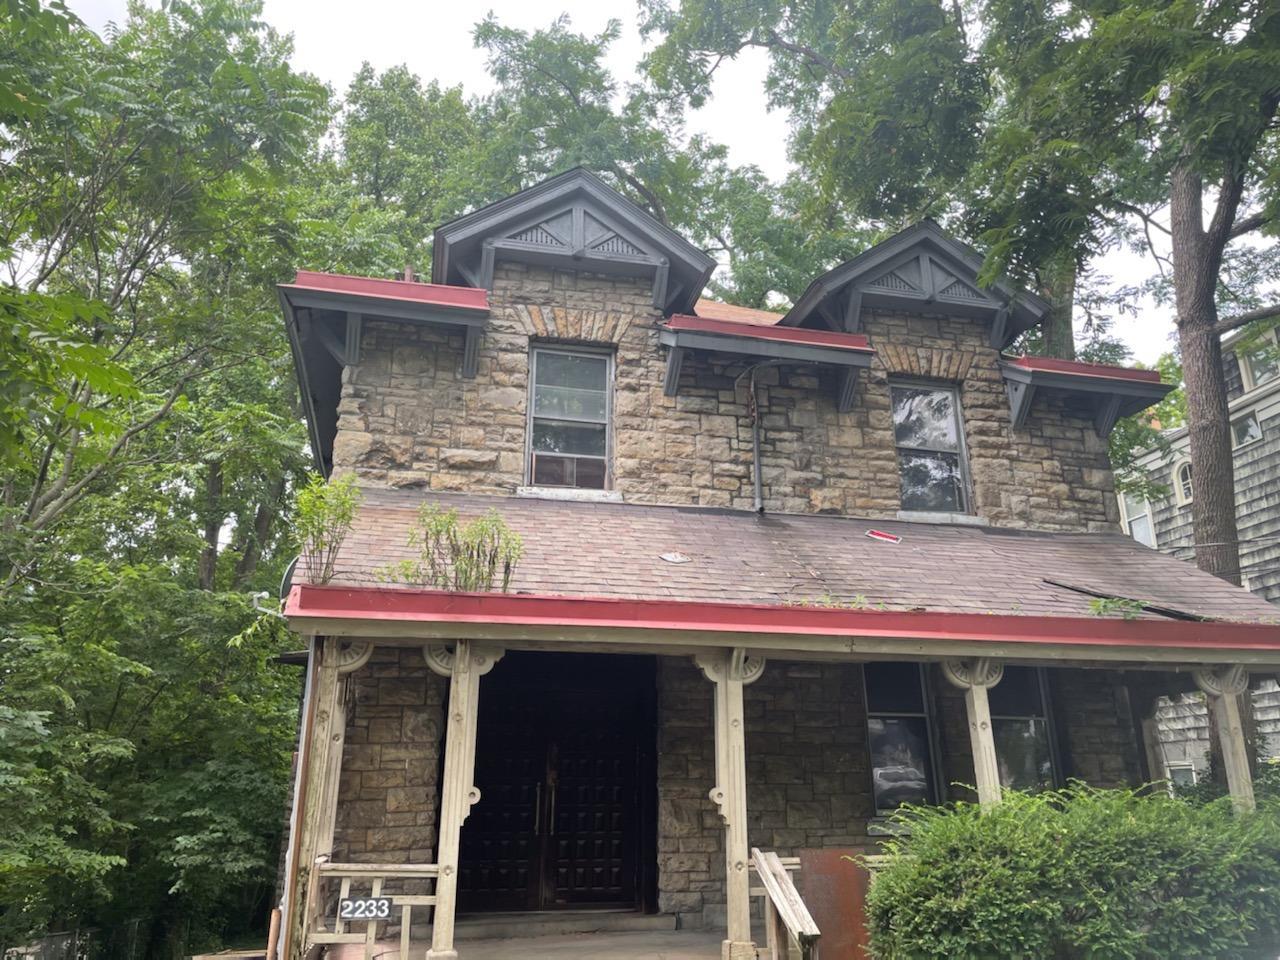 2233 Kemper Lane, Cincinnati, Ohio 45206, 3 Bedrooms Bedrooms, 6 Rooms Rooms,2 BathroomsBathrooms,Single Family Residence,For Sale,Kemper,1708293